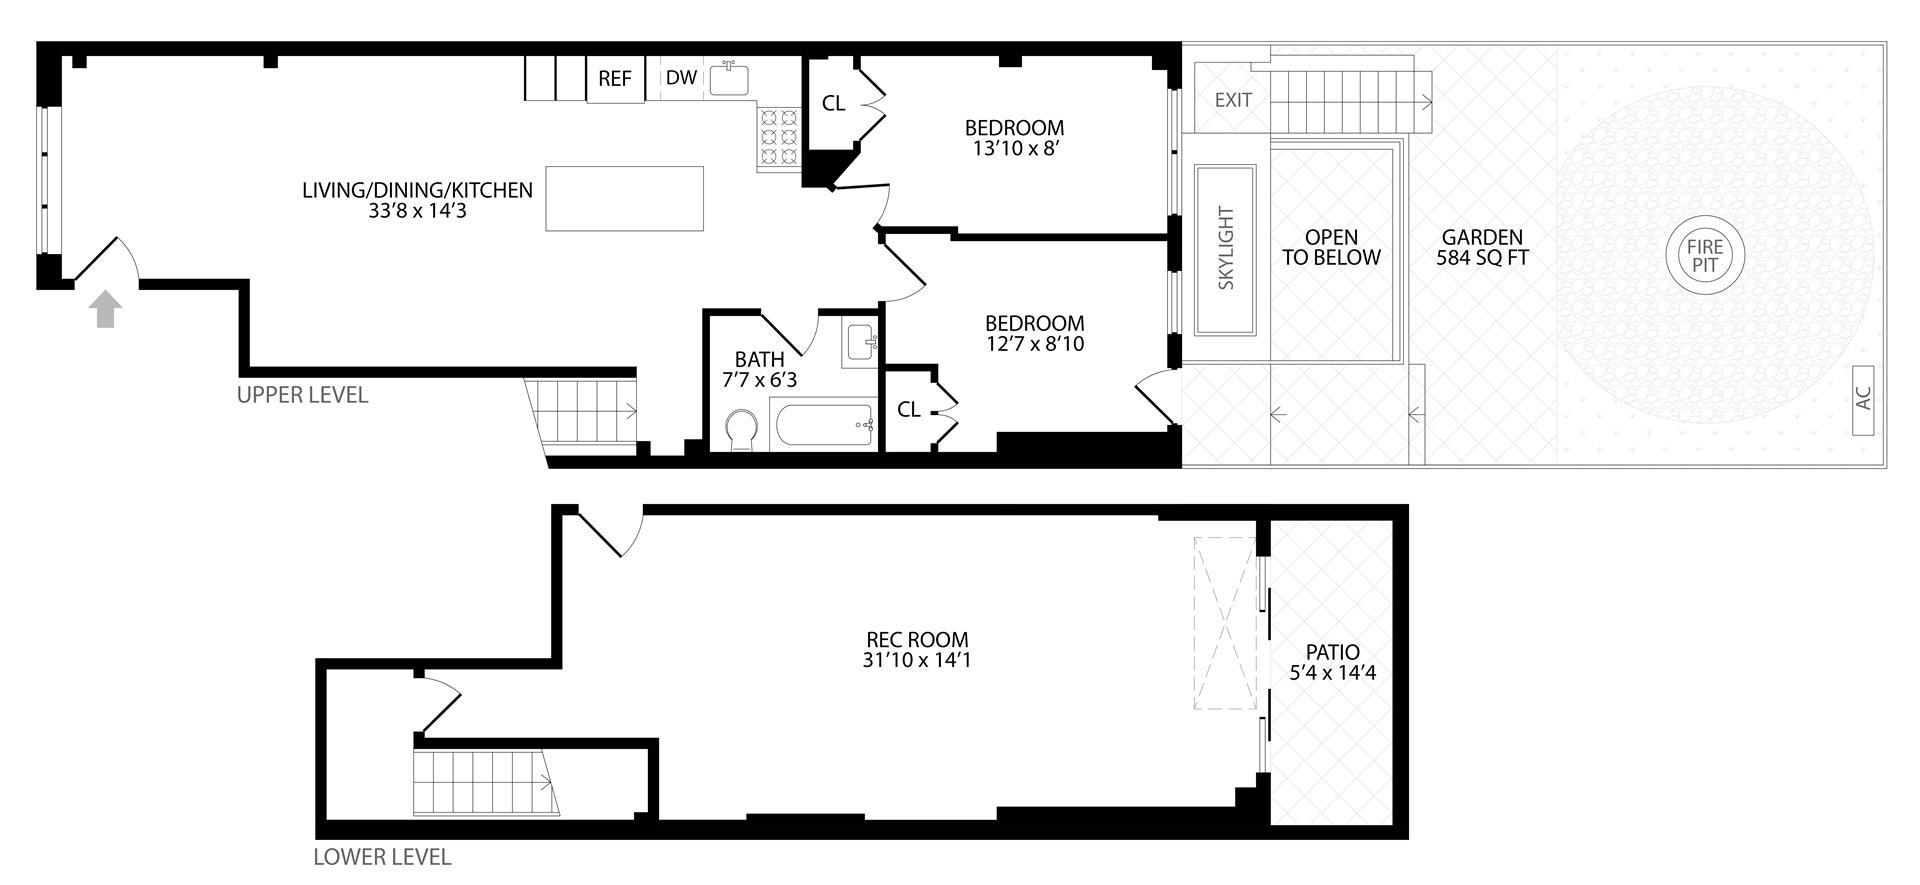 Floor plan of 219 Weirfield St, 1 - Bushwick, New York